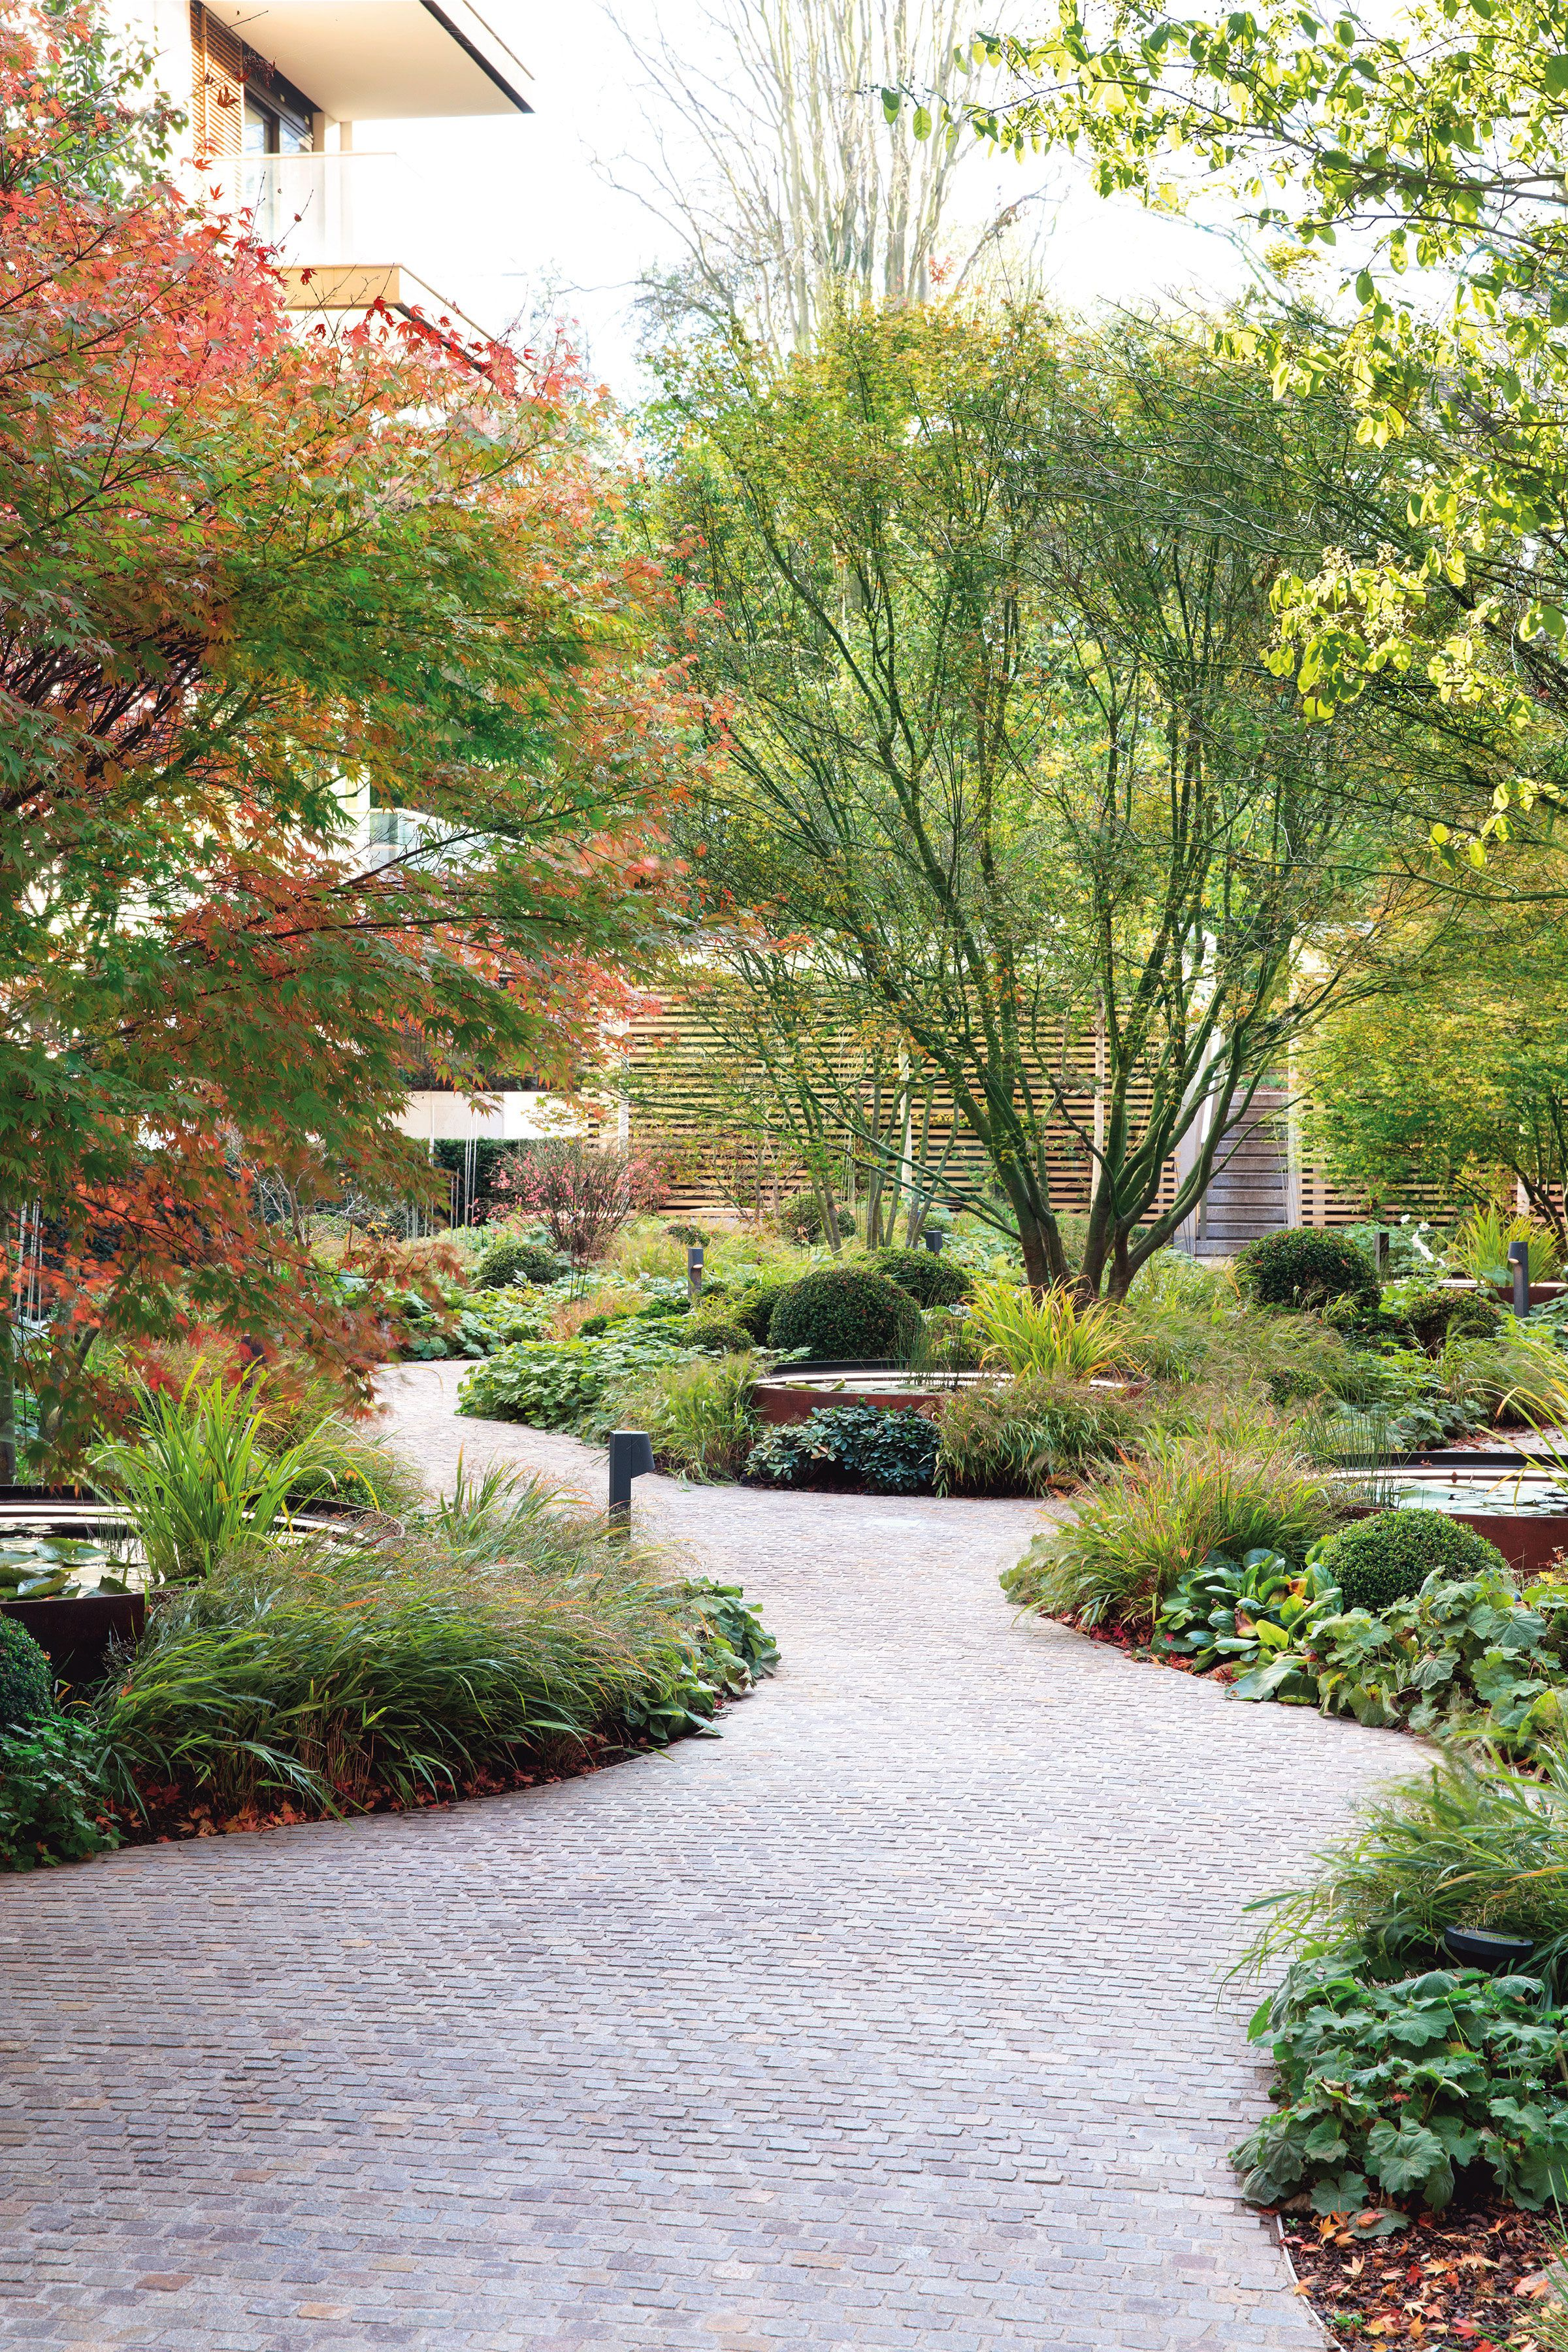 holland park villas by Gillespies